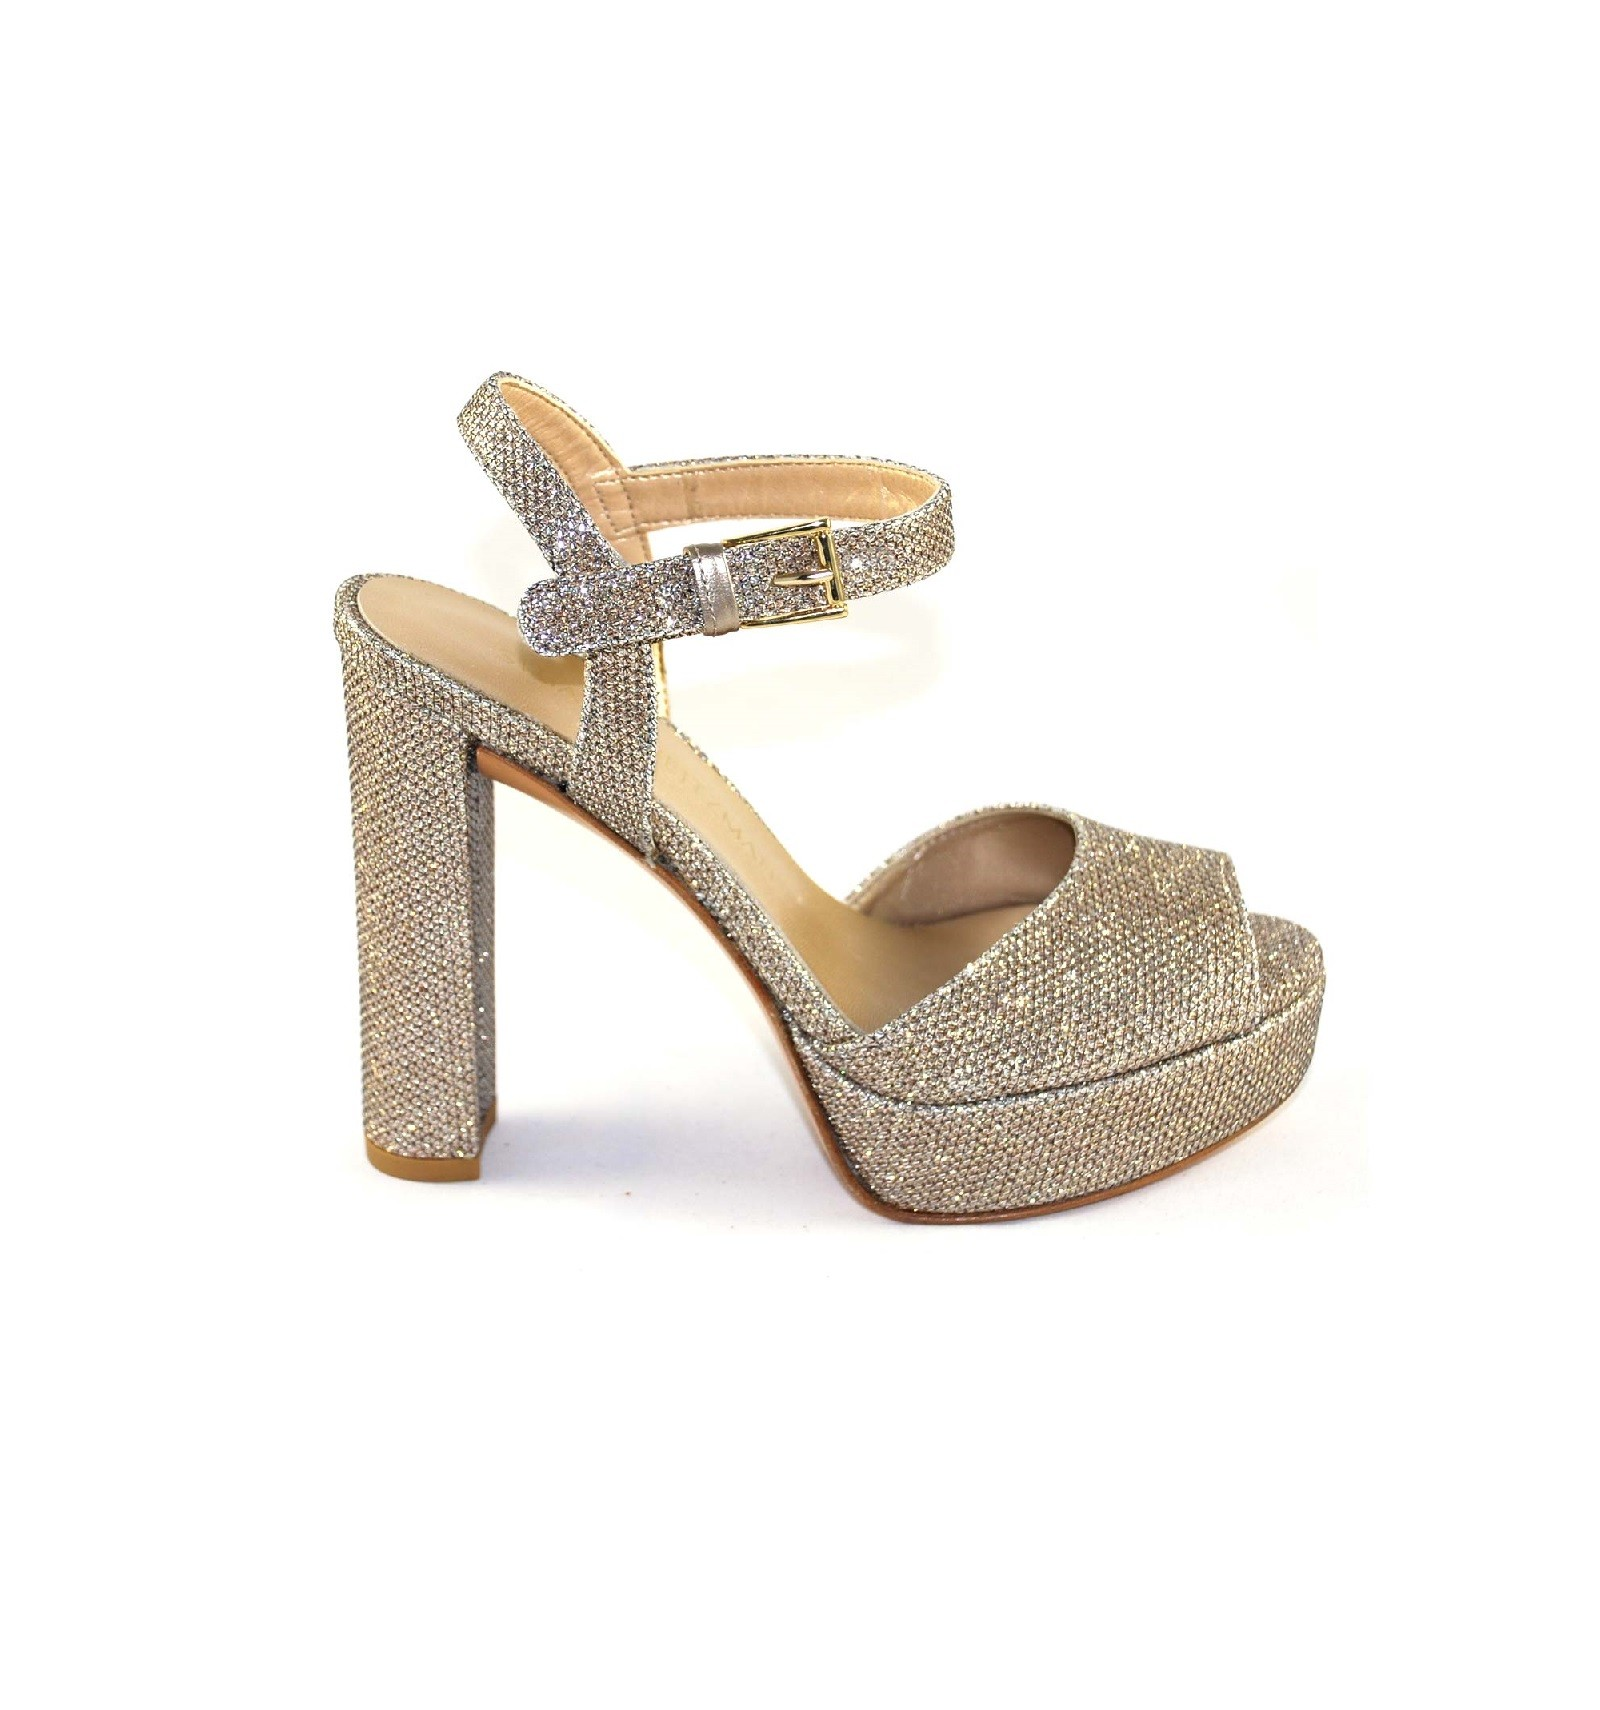 Sandalo Stuart Weitzman - Nino Armenise - Calzature 40c1d84d0cd